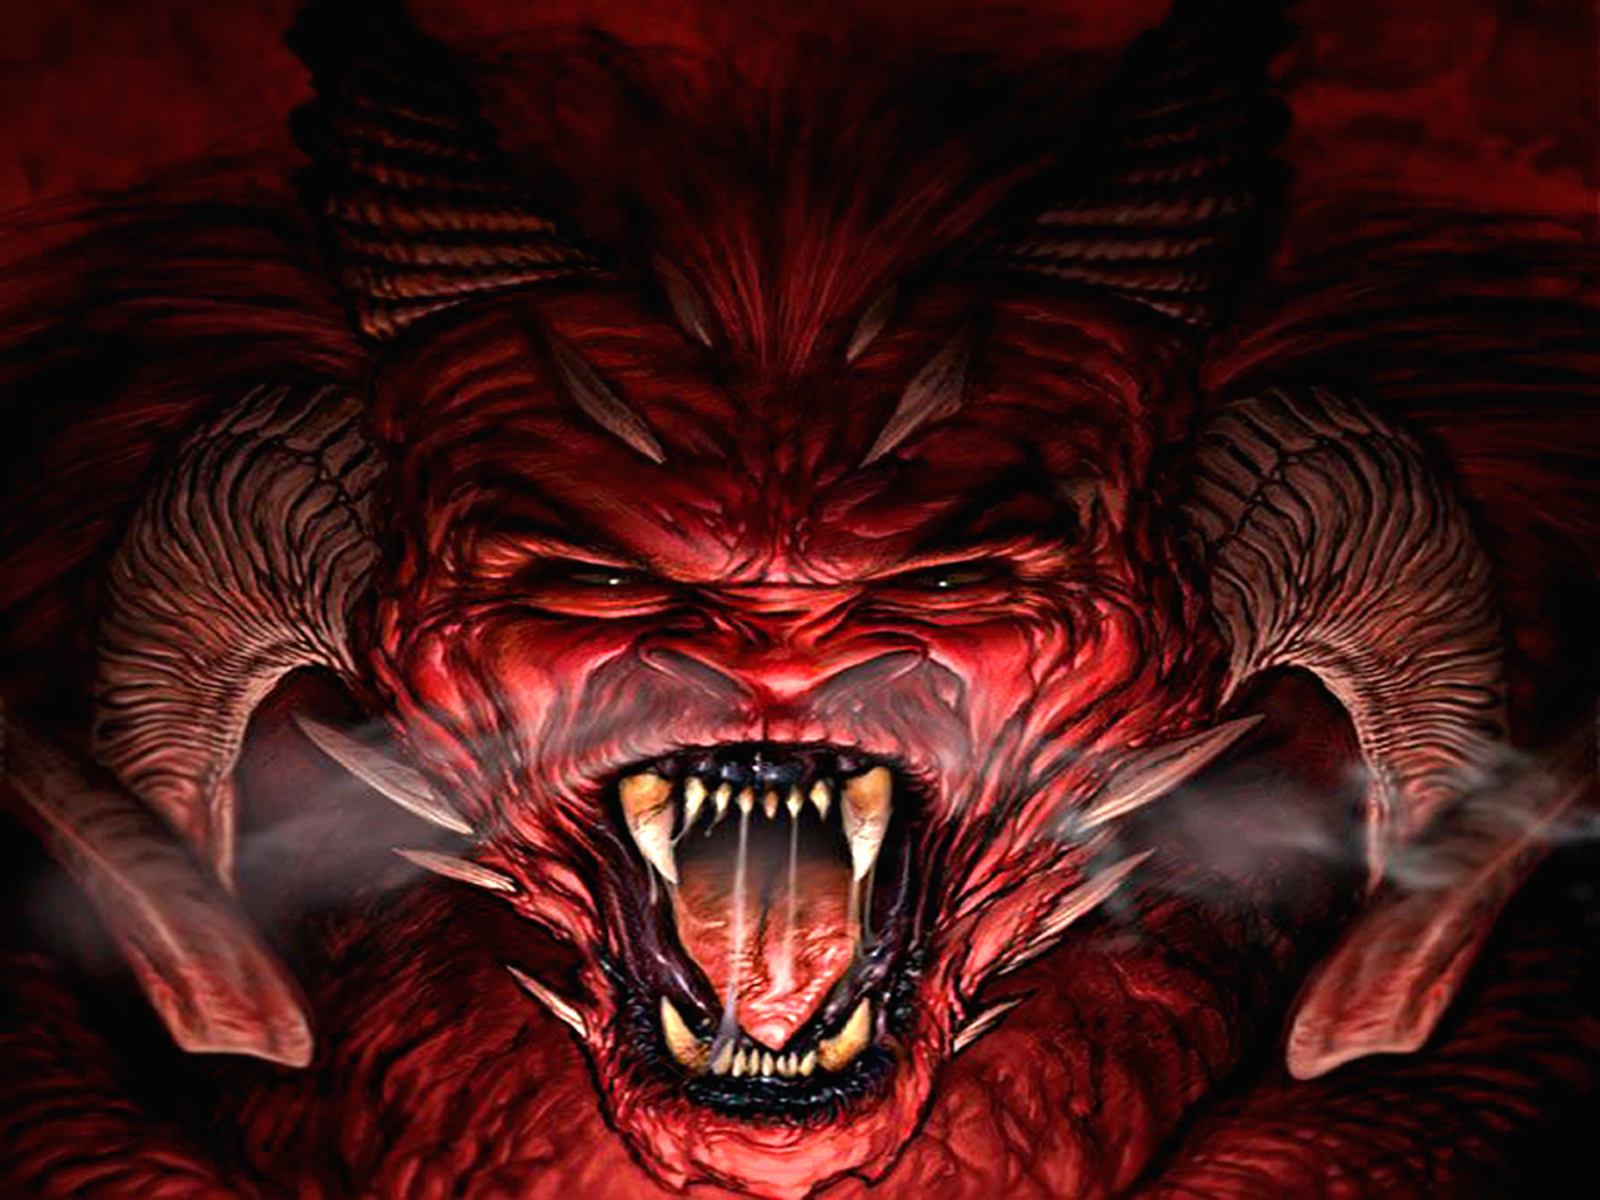 Dark Demon Wallpaper 1600x1200 Dark Demon 1600x1200